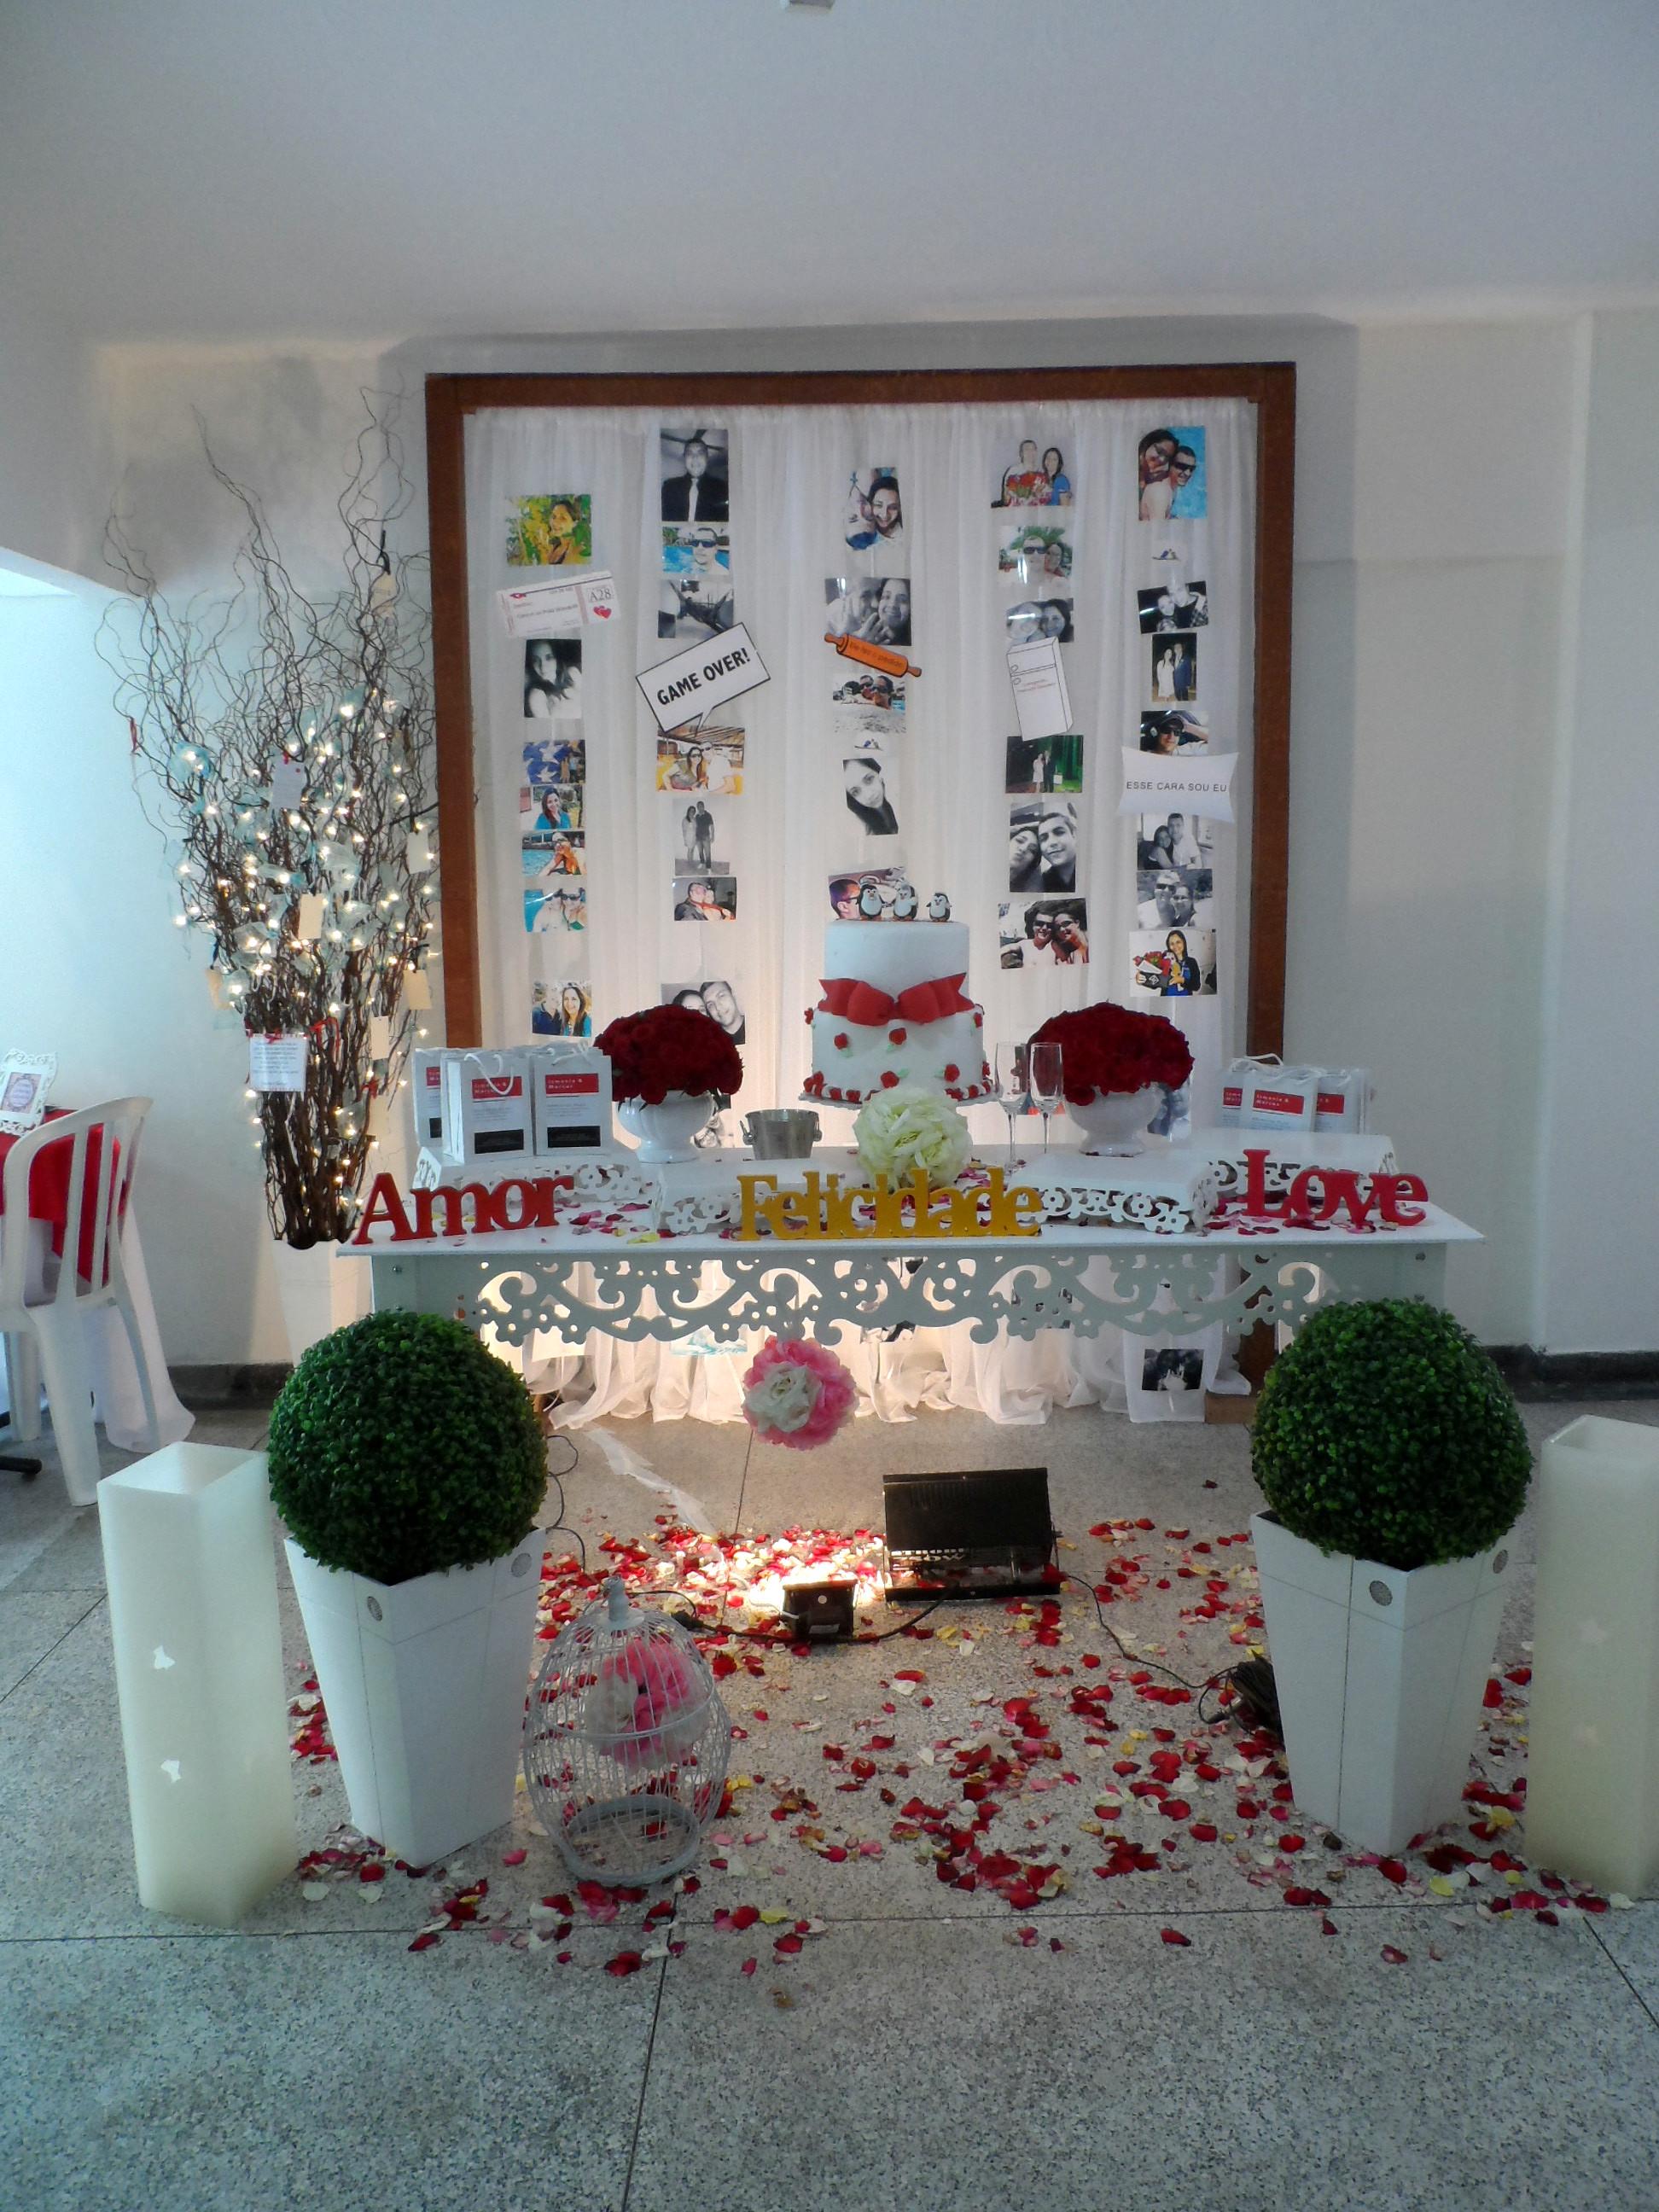 decoracao festa noivado : decoracao festa noivado:decoracao-noivado-provencal-decoracao-de-festa-provencal